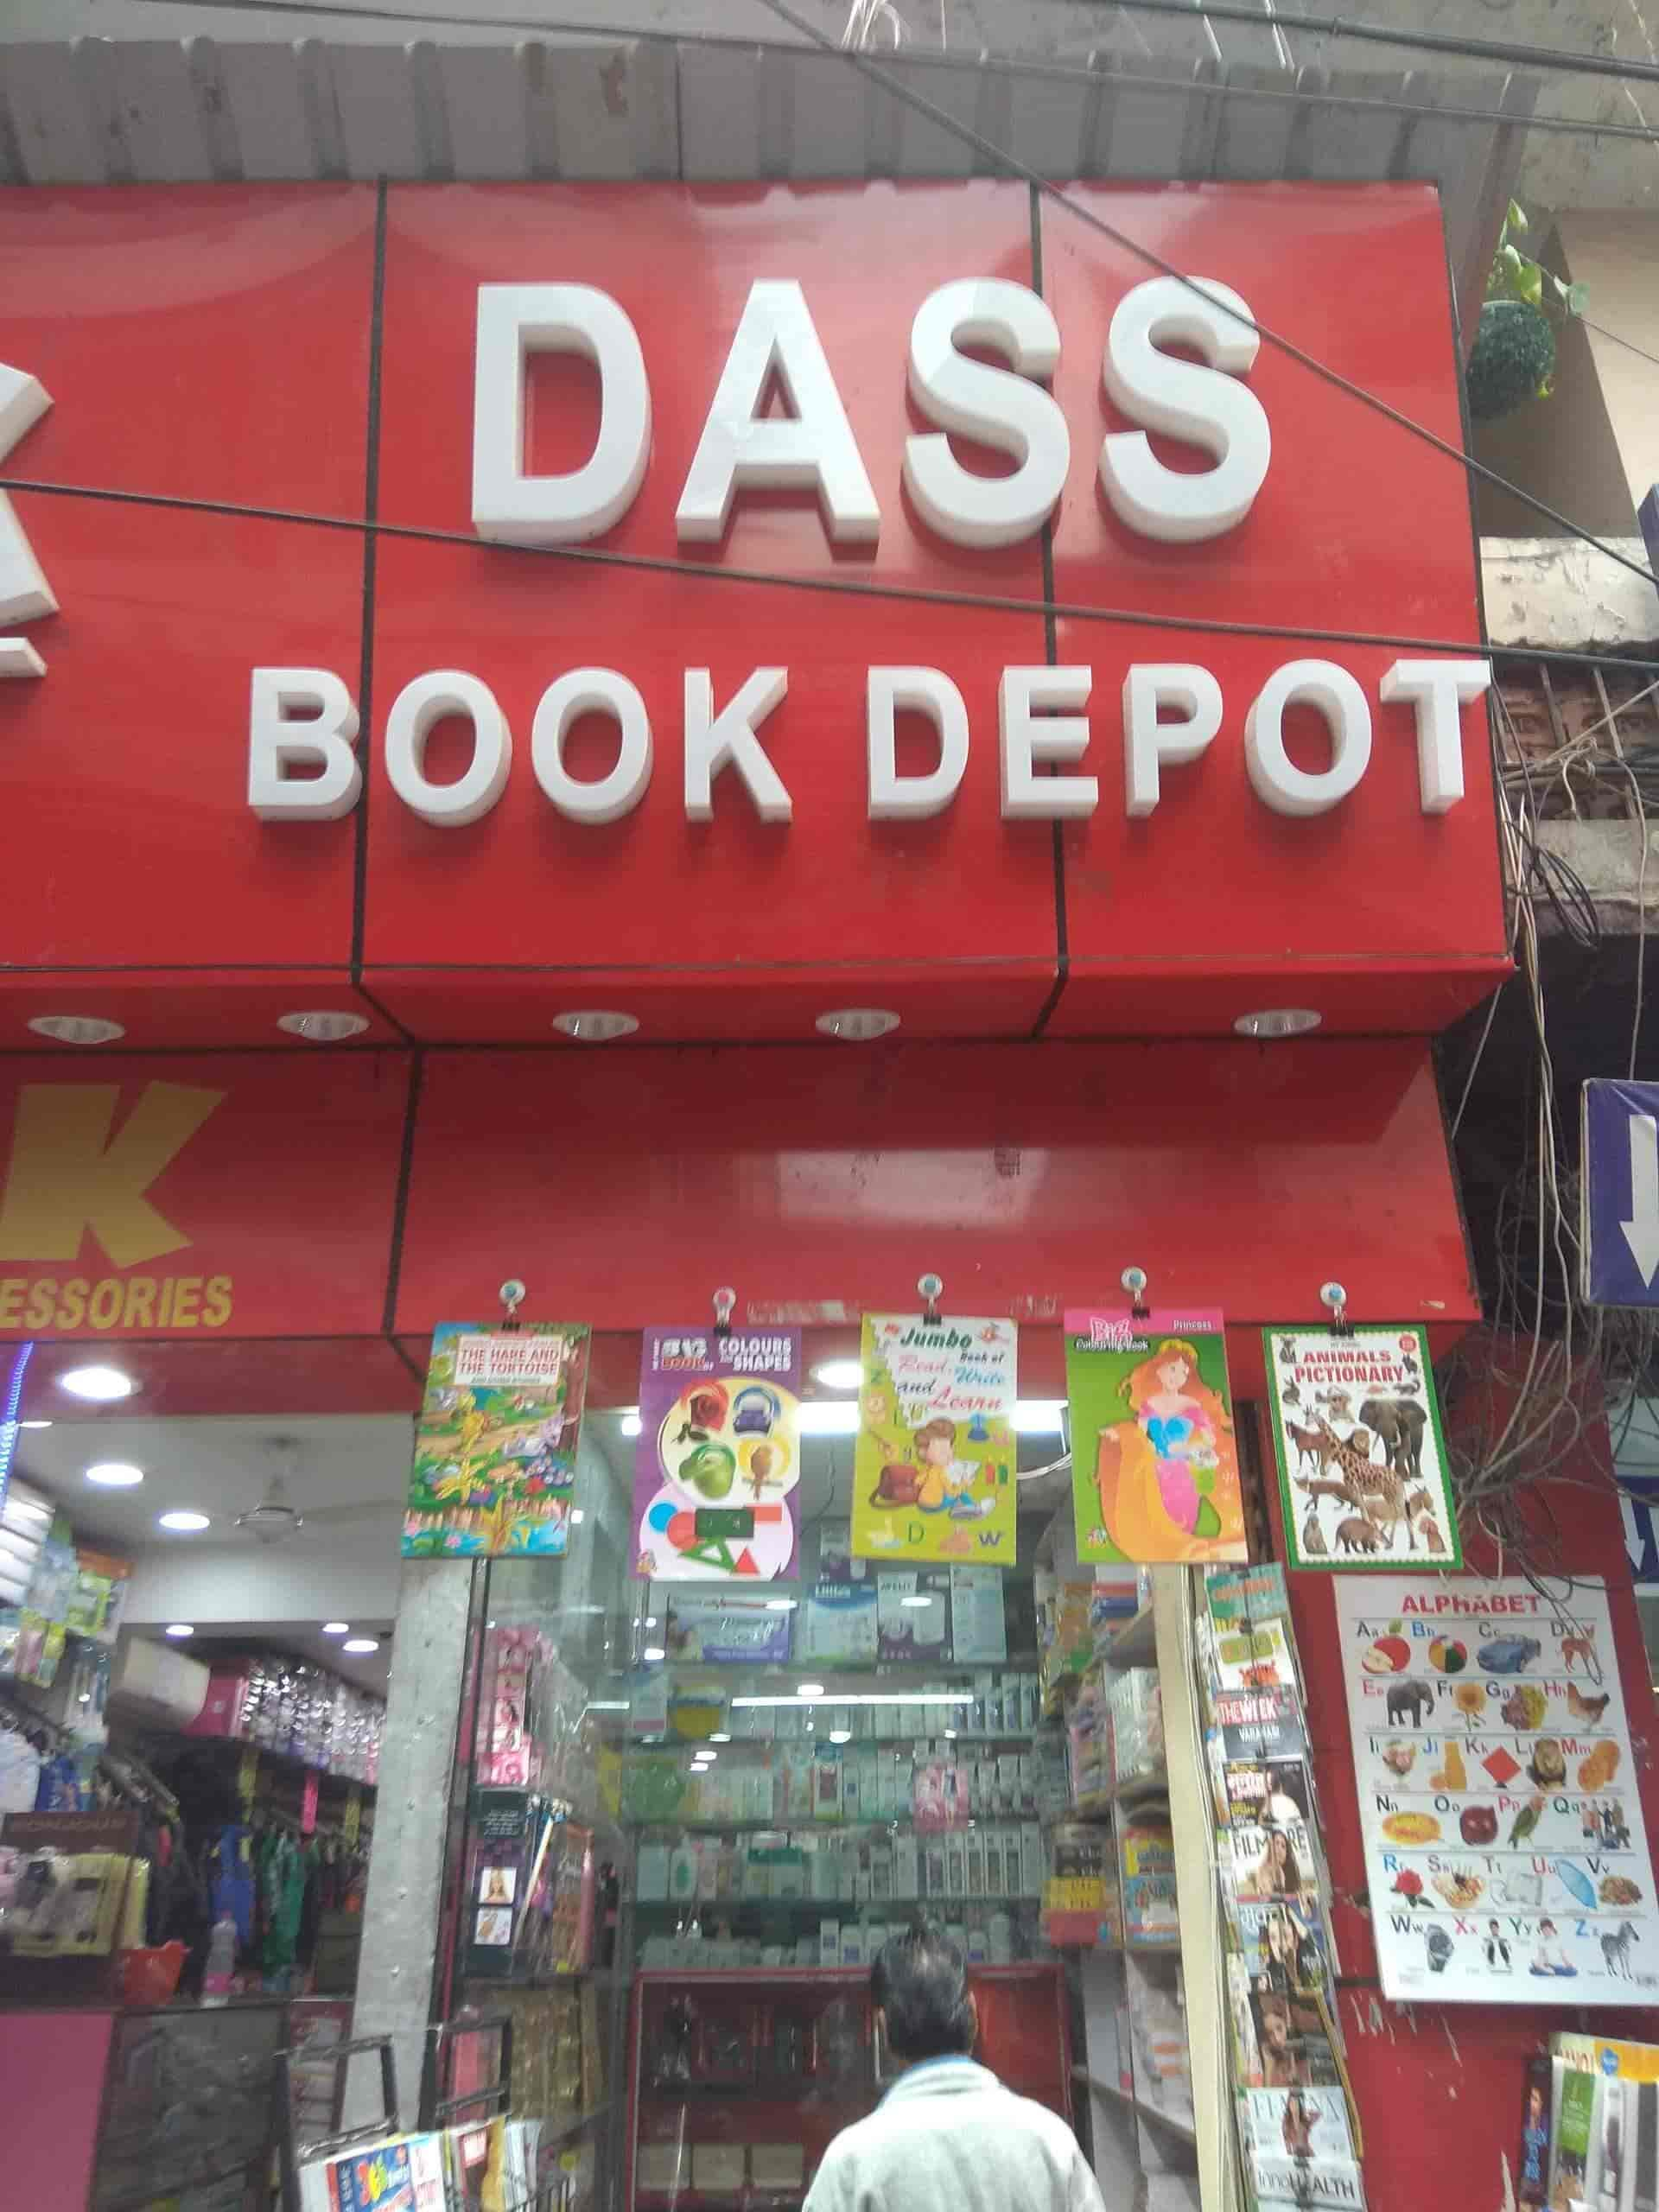 3ac1daf551 Dass Book Depot, Tilak Nagar - Gift Shops in Delhi - Justdial